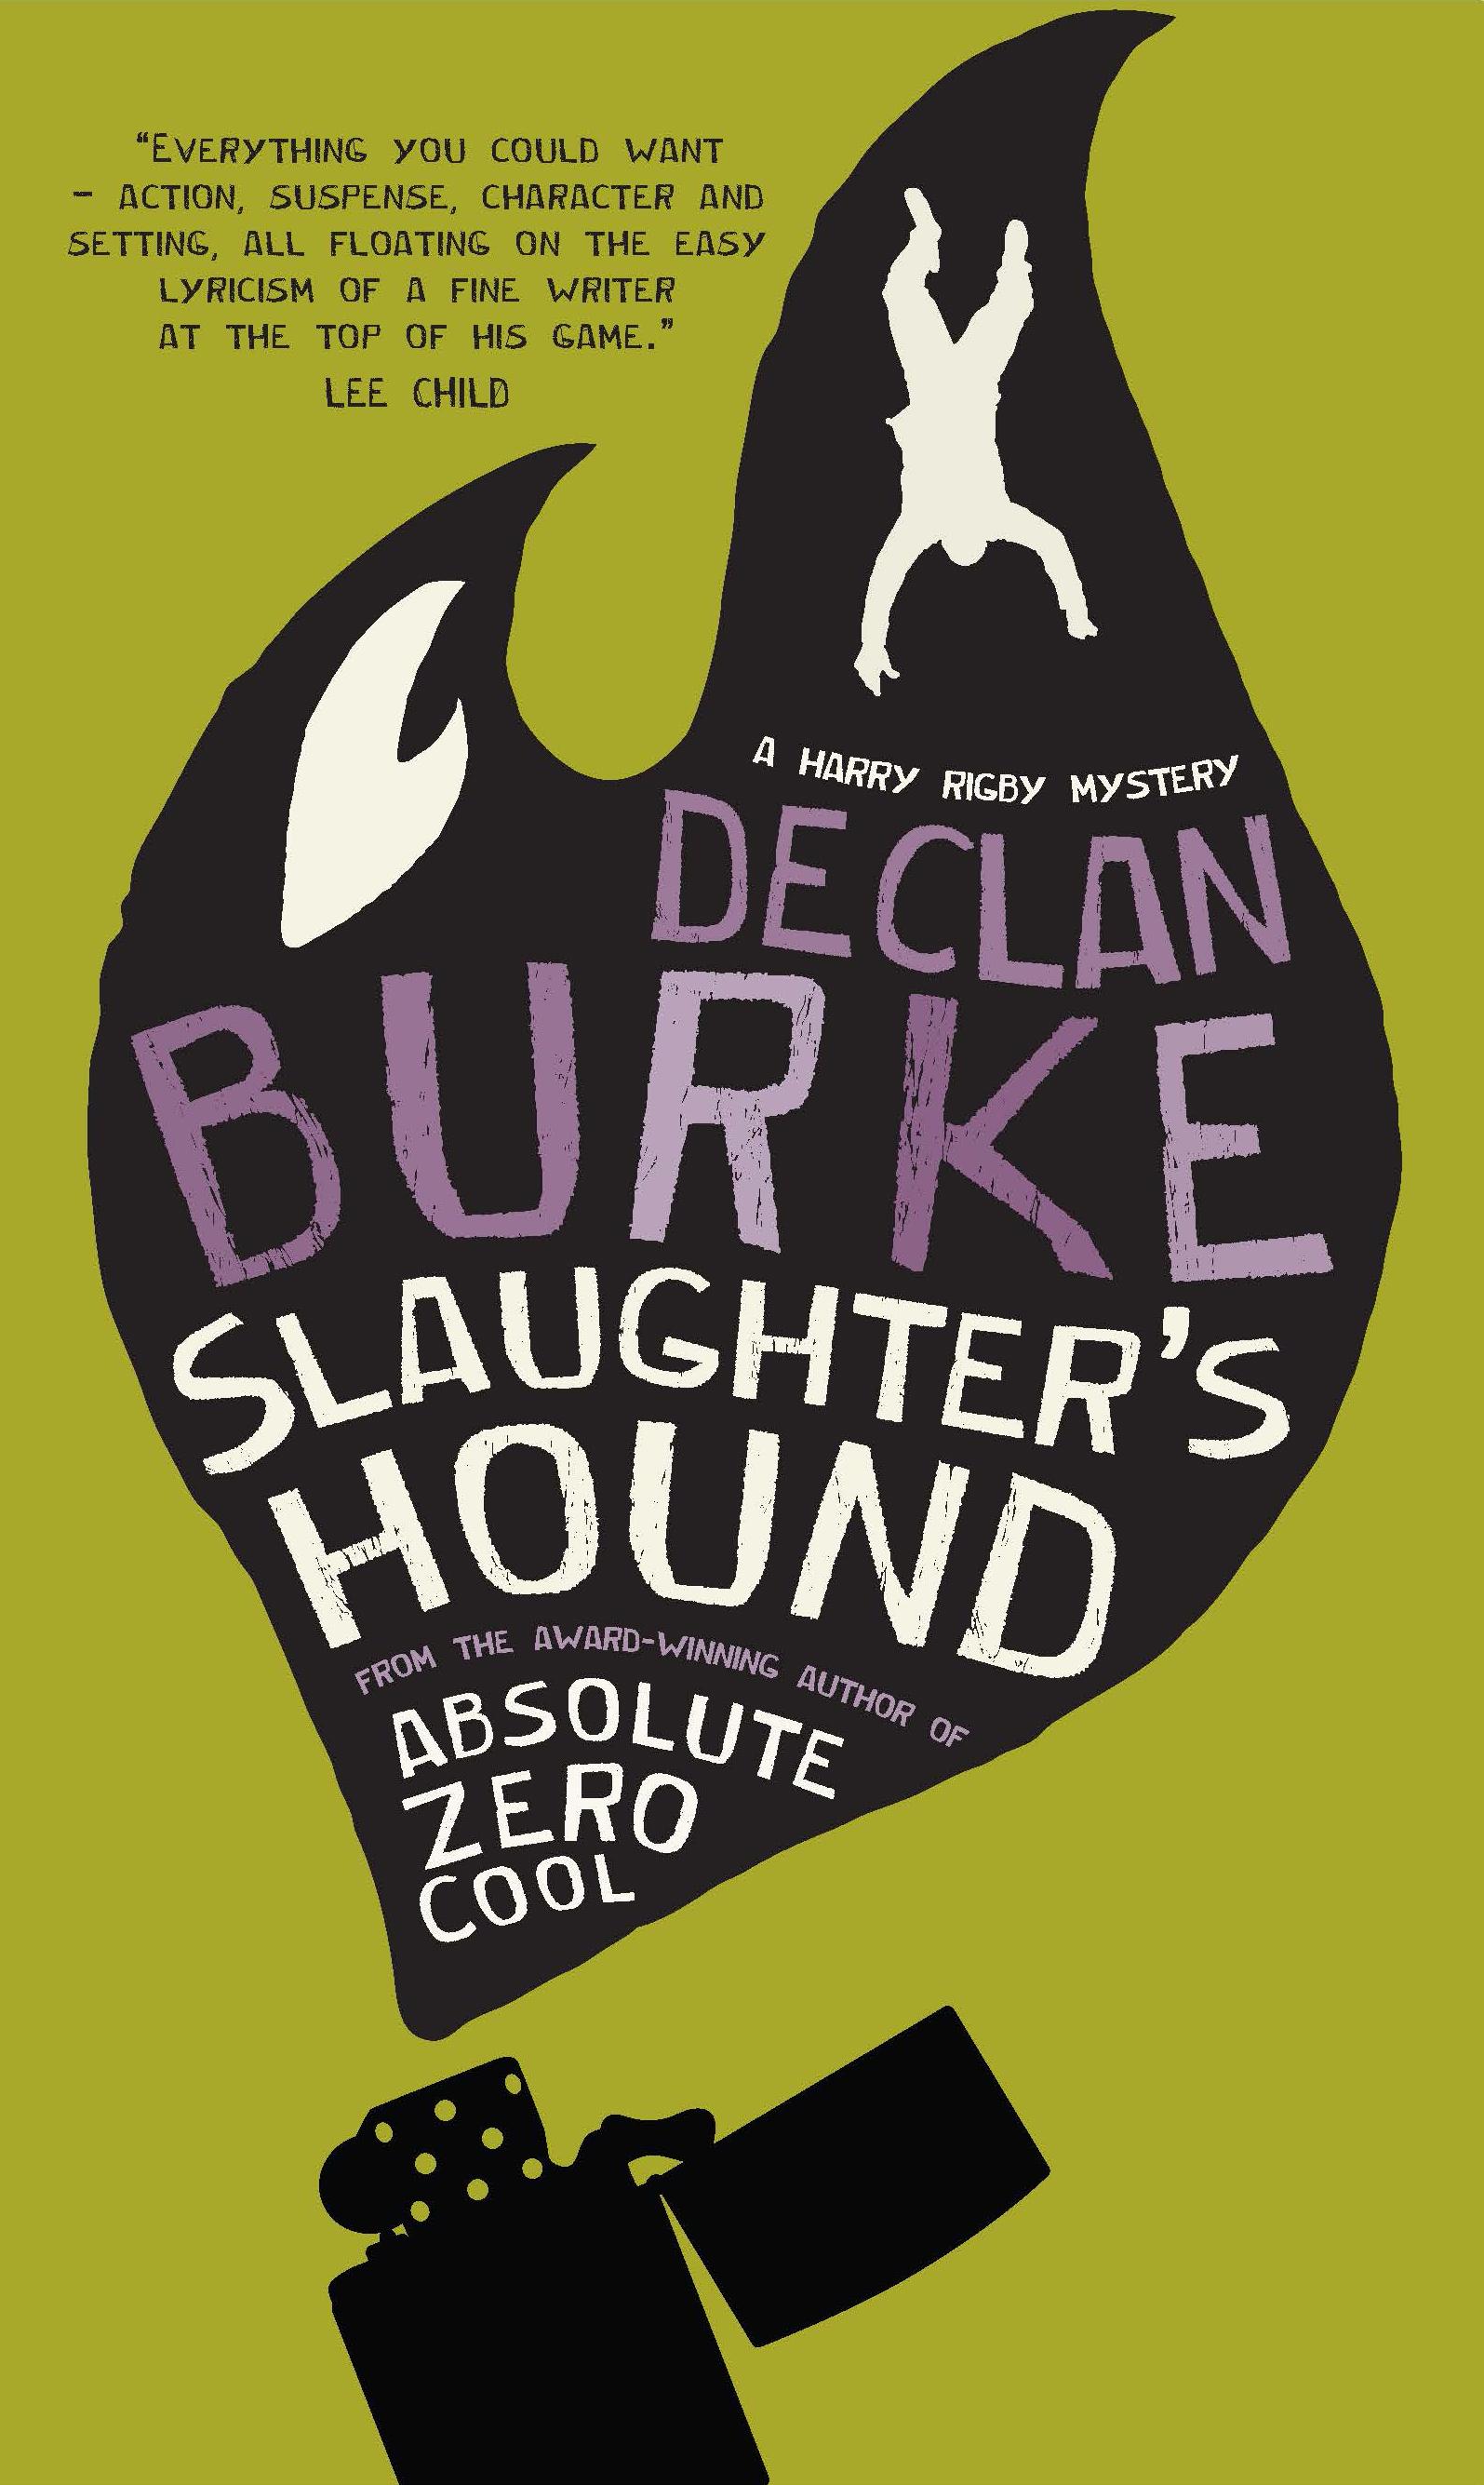 Slaughter's Hound by Irish Crime writer Declan Burke